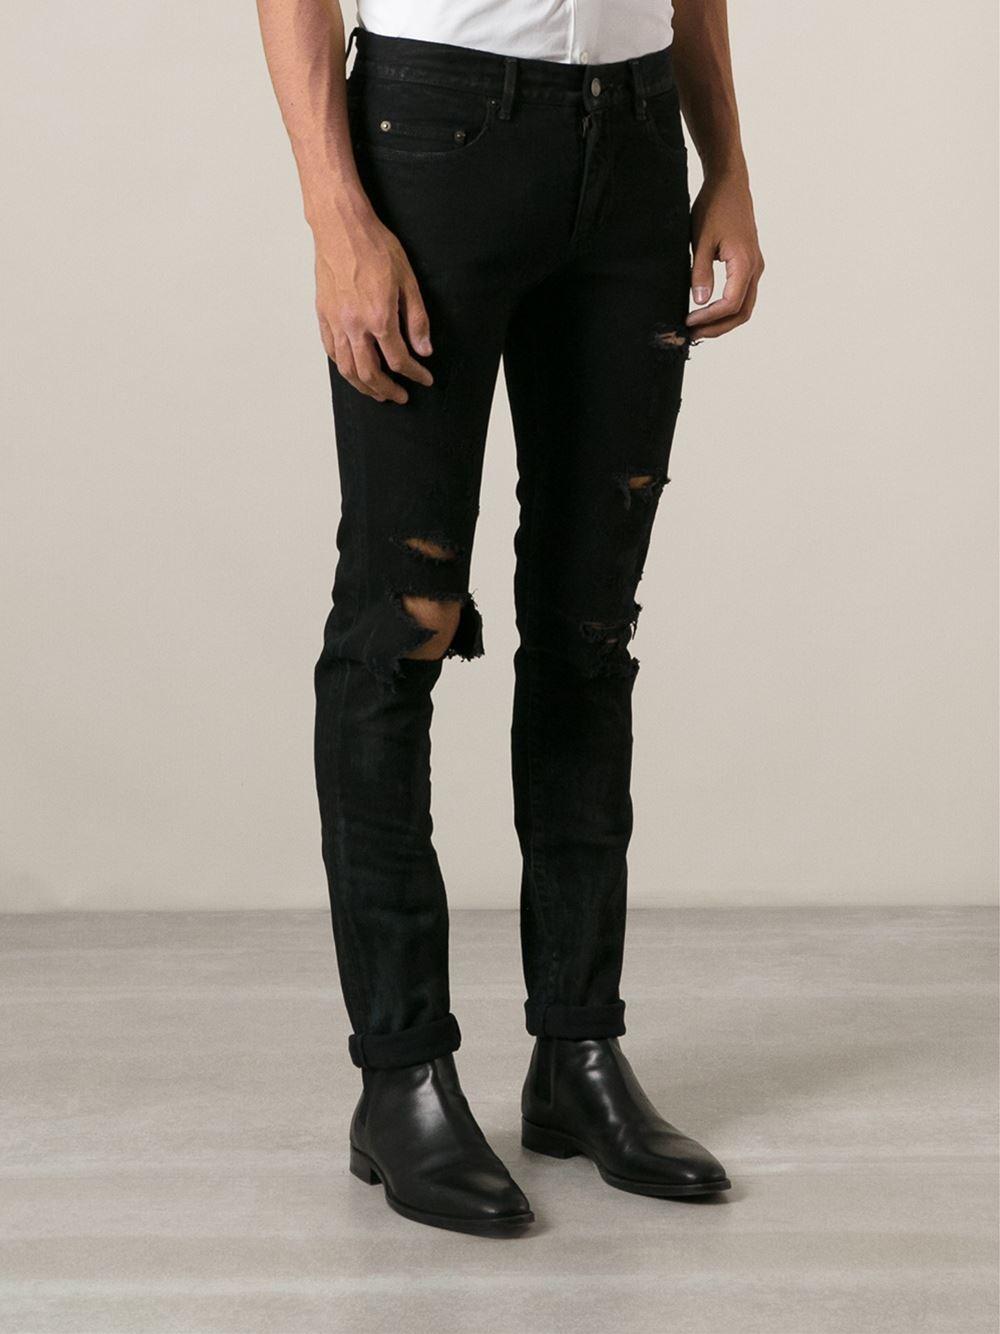 Saint laurent Distressed Skinny Jeans in Black for Men | Lyst